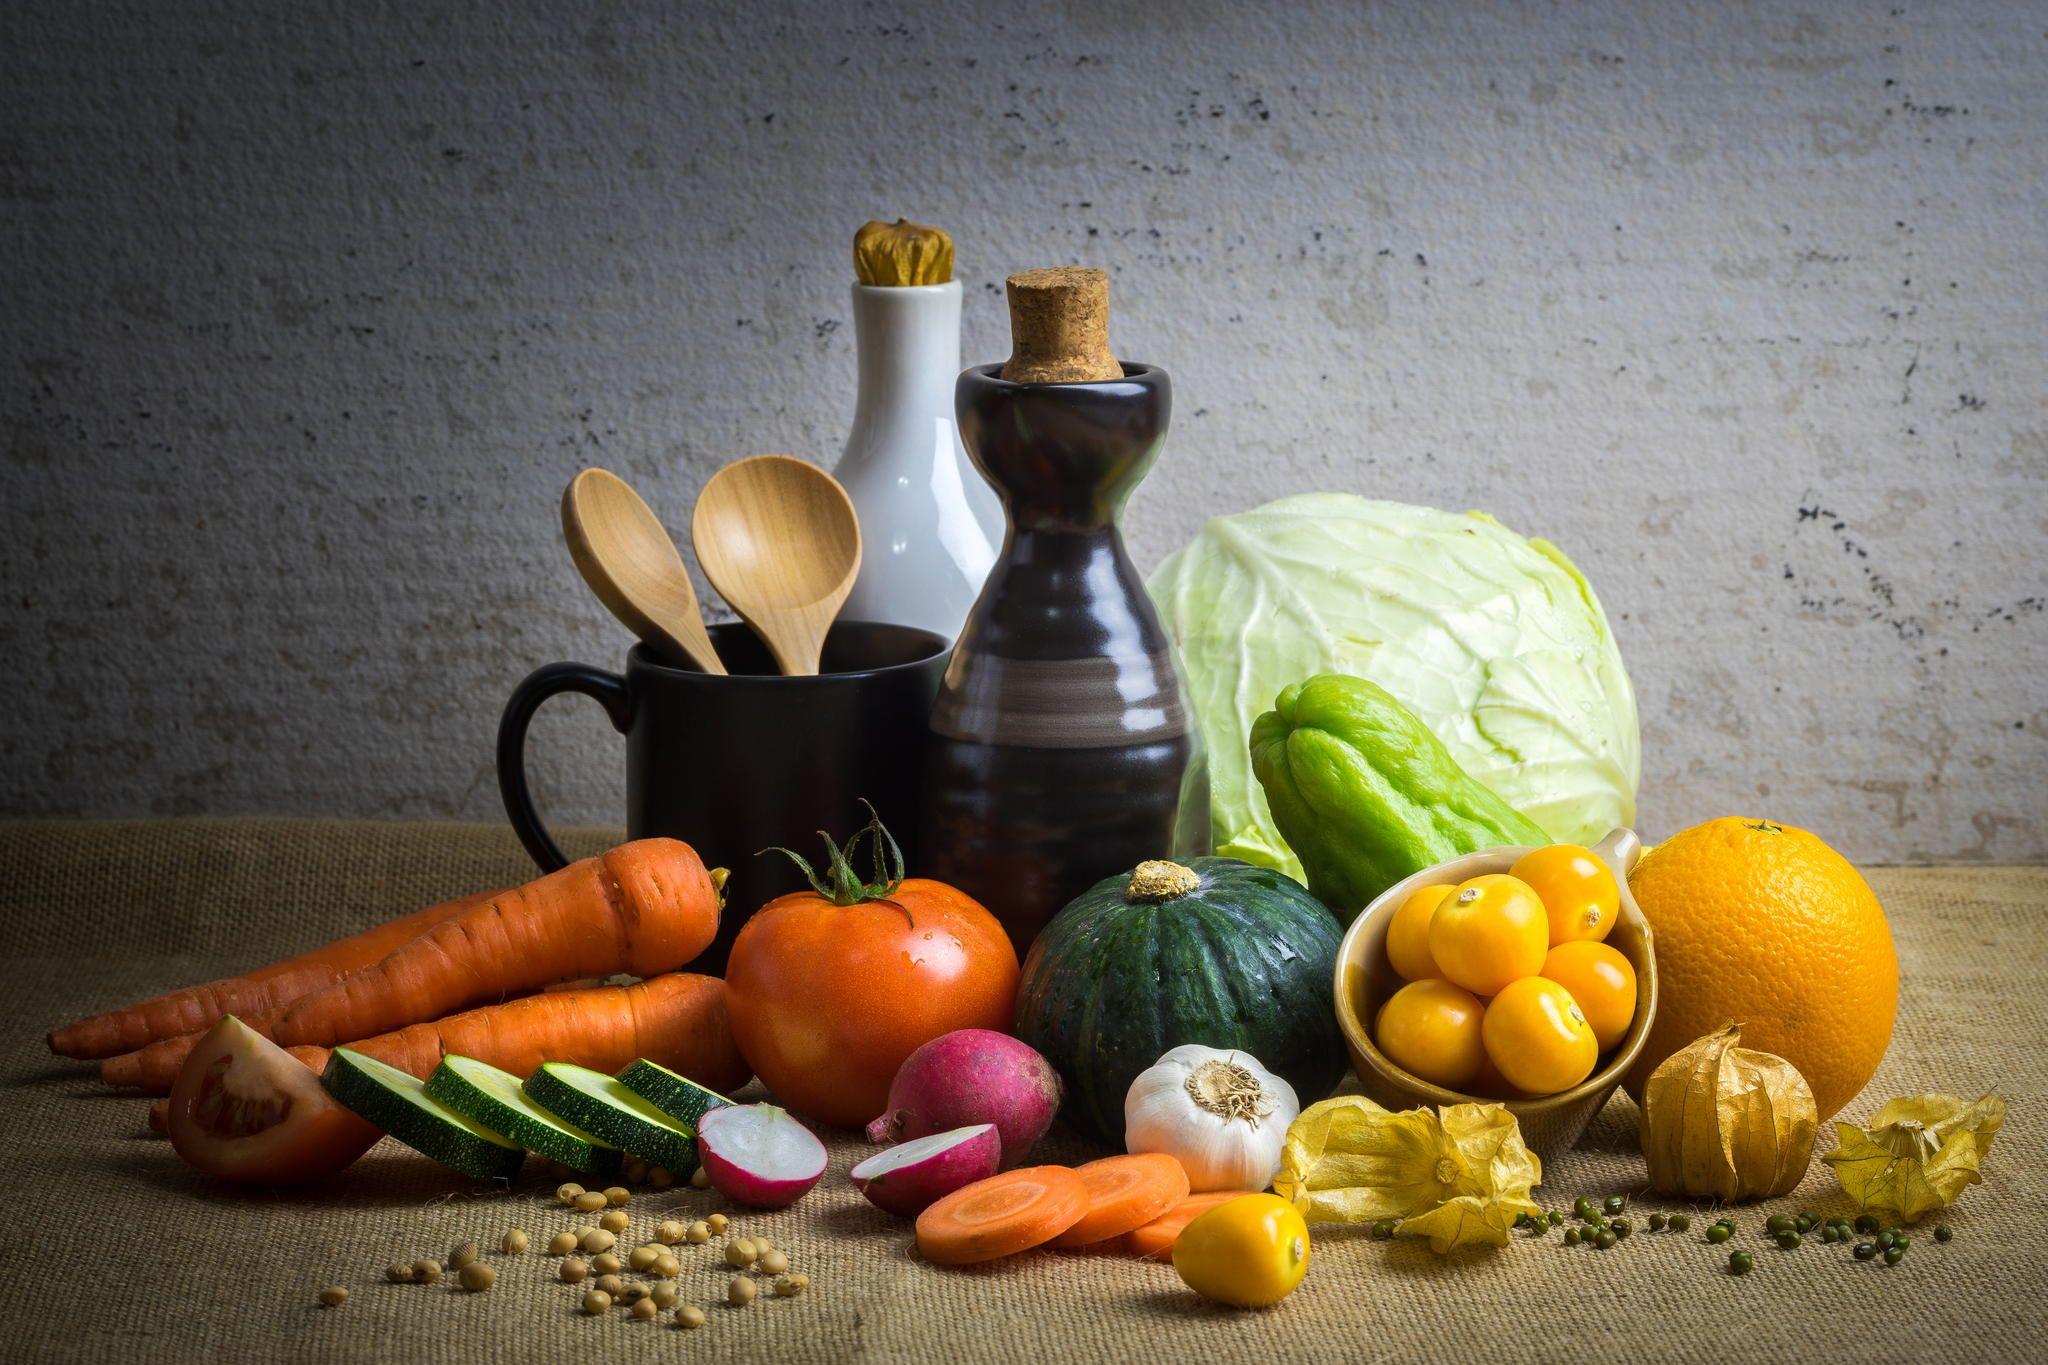 Still life vegetable by Worac on 500px in 2020 Still